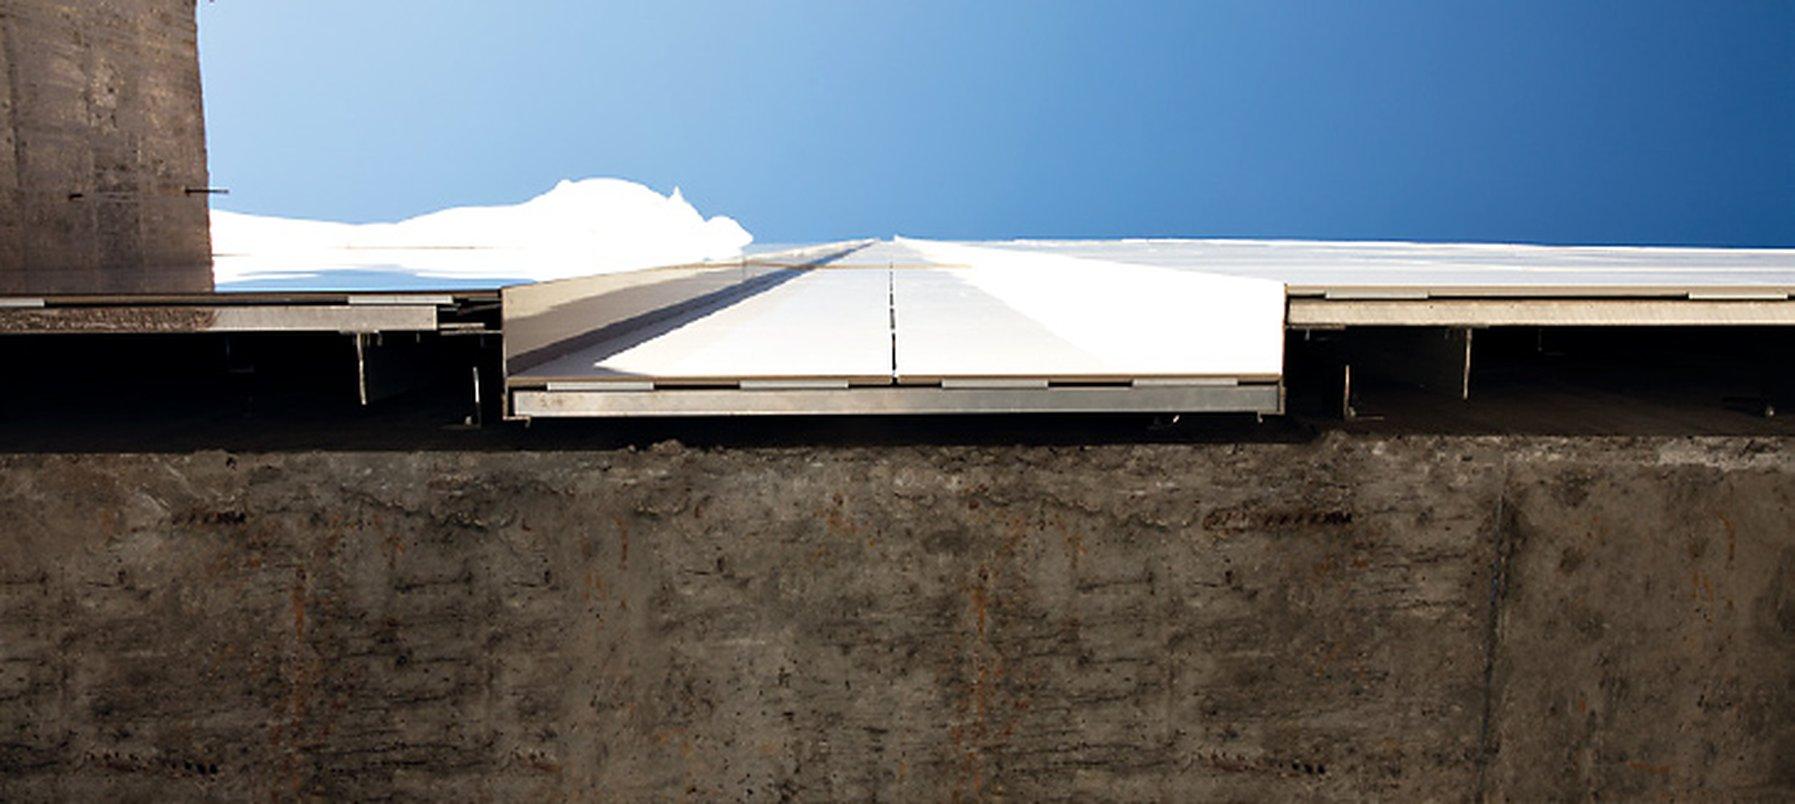 Sunset Plaza Residence Club - Maringá, PR - Equipe: Ingabello Representação - Arquiteto: Mendes Cardoso Arq.